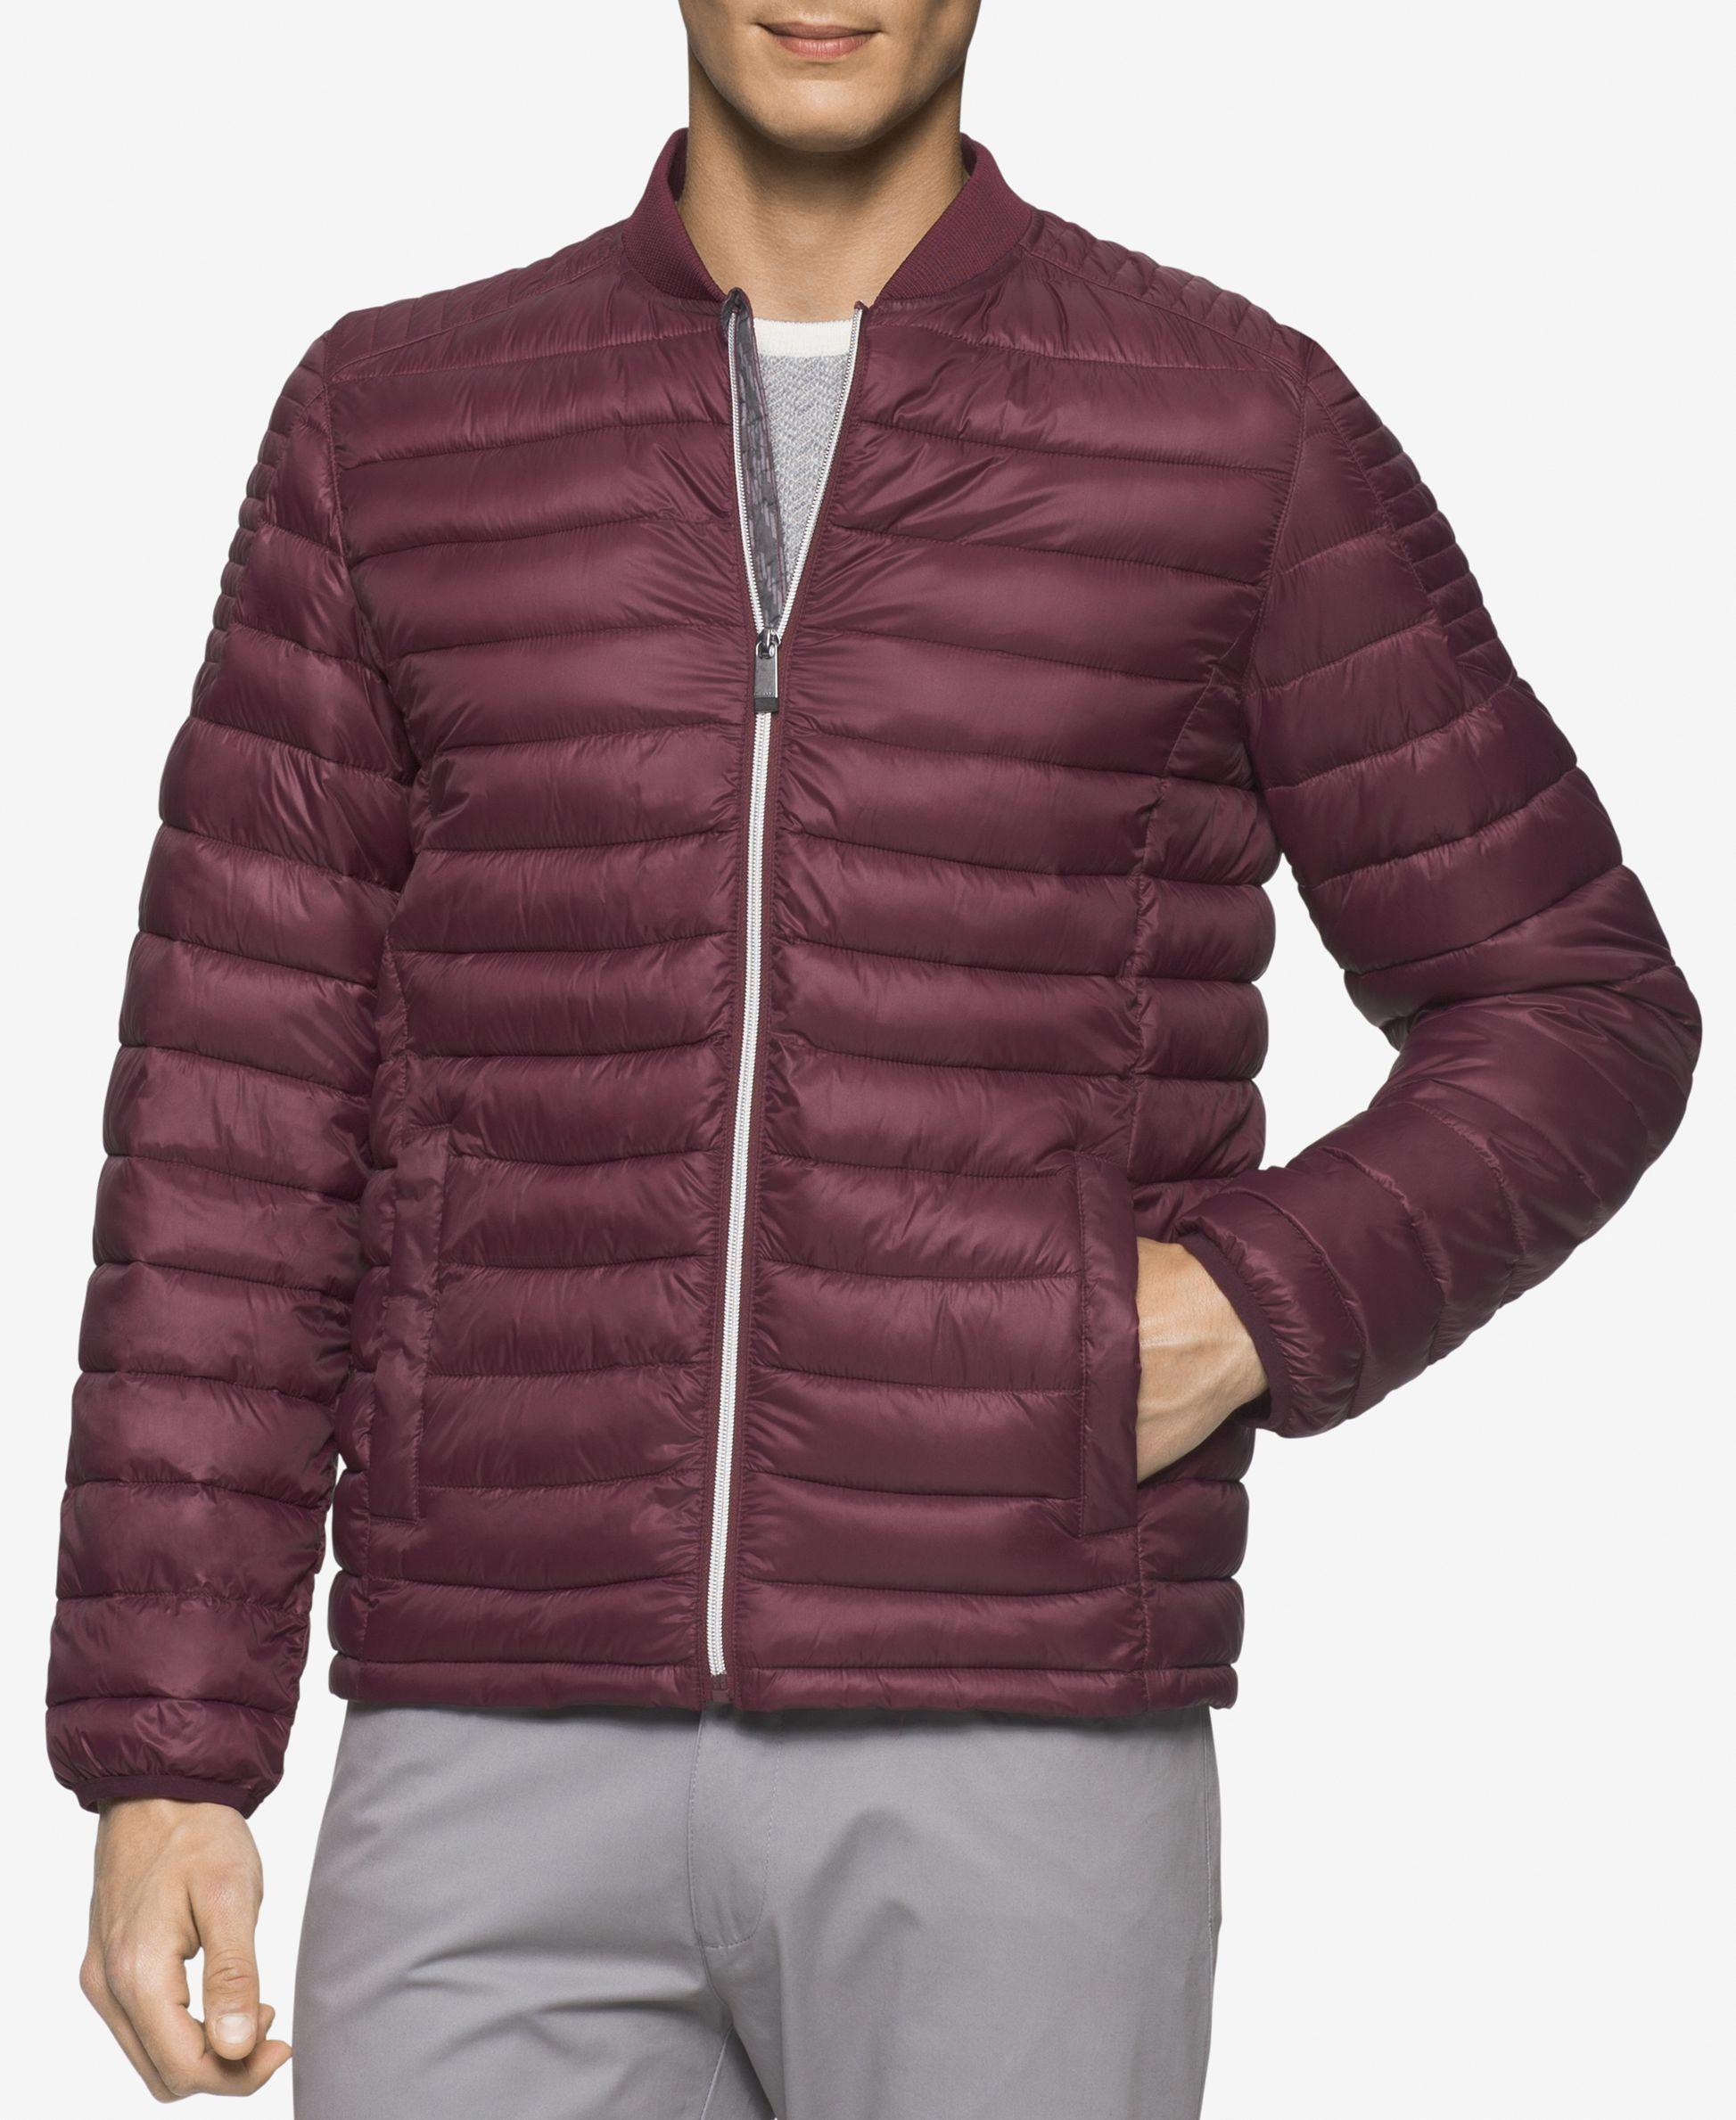 Calvin Klein Men S Dressy Packable Puffer Jacket Mensoutfits Dressymensfashion Mens Outfits Jackets Calvin Klein Men [ 2378 x 1947 Pixel ]